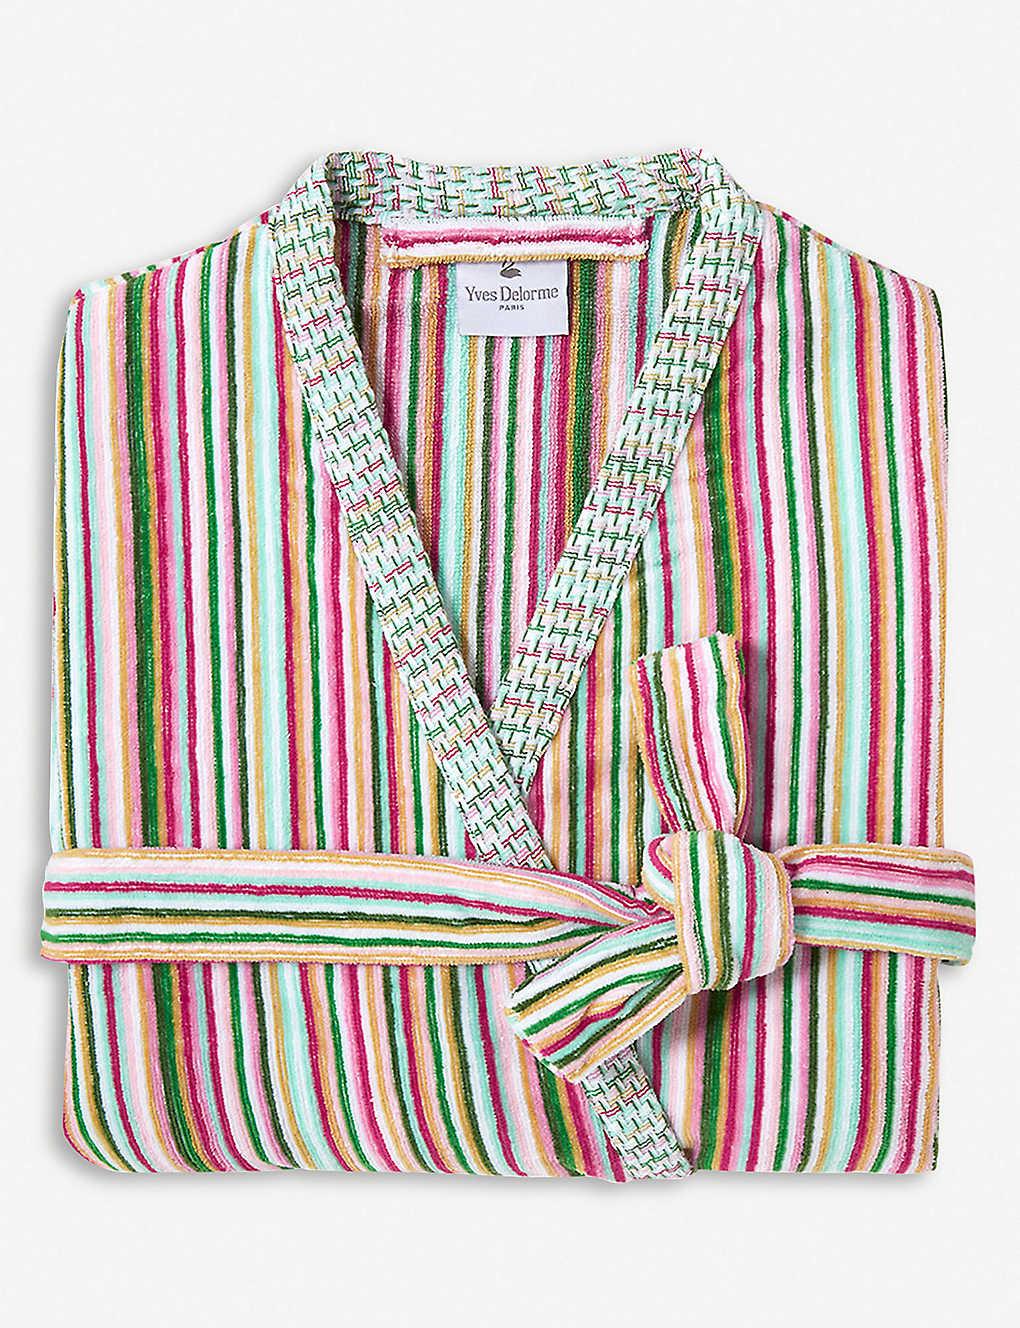 YVES DELORME - Rivages Flamant cotton bathrobe  203a1bb8d